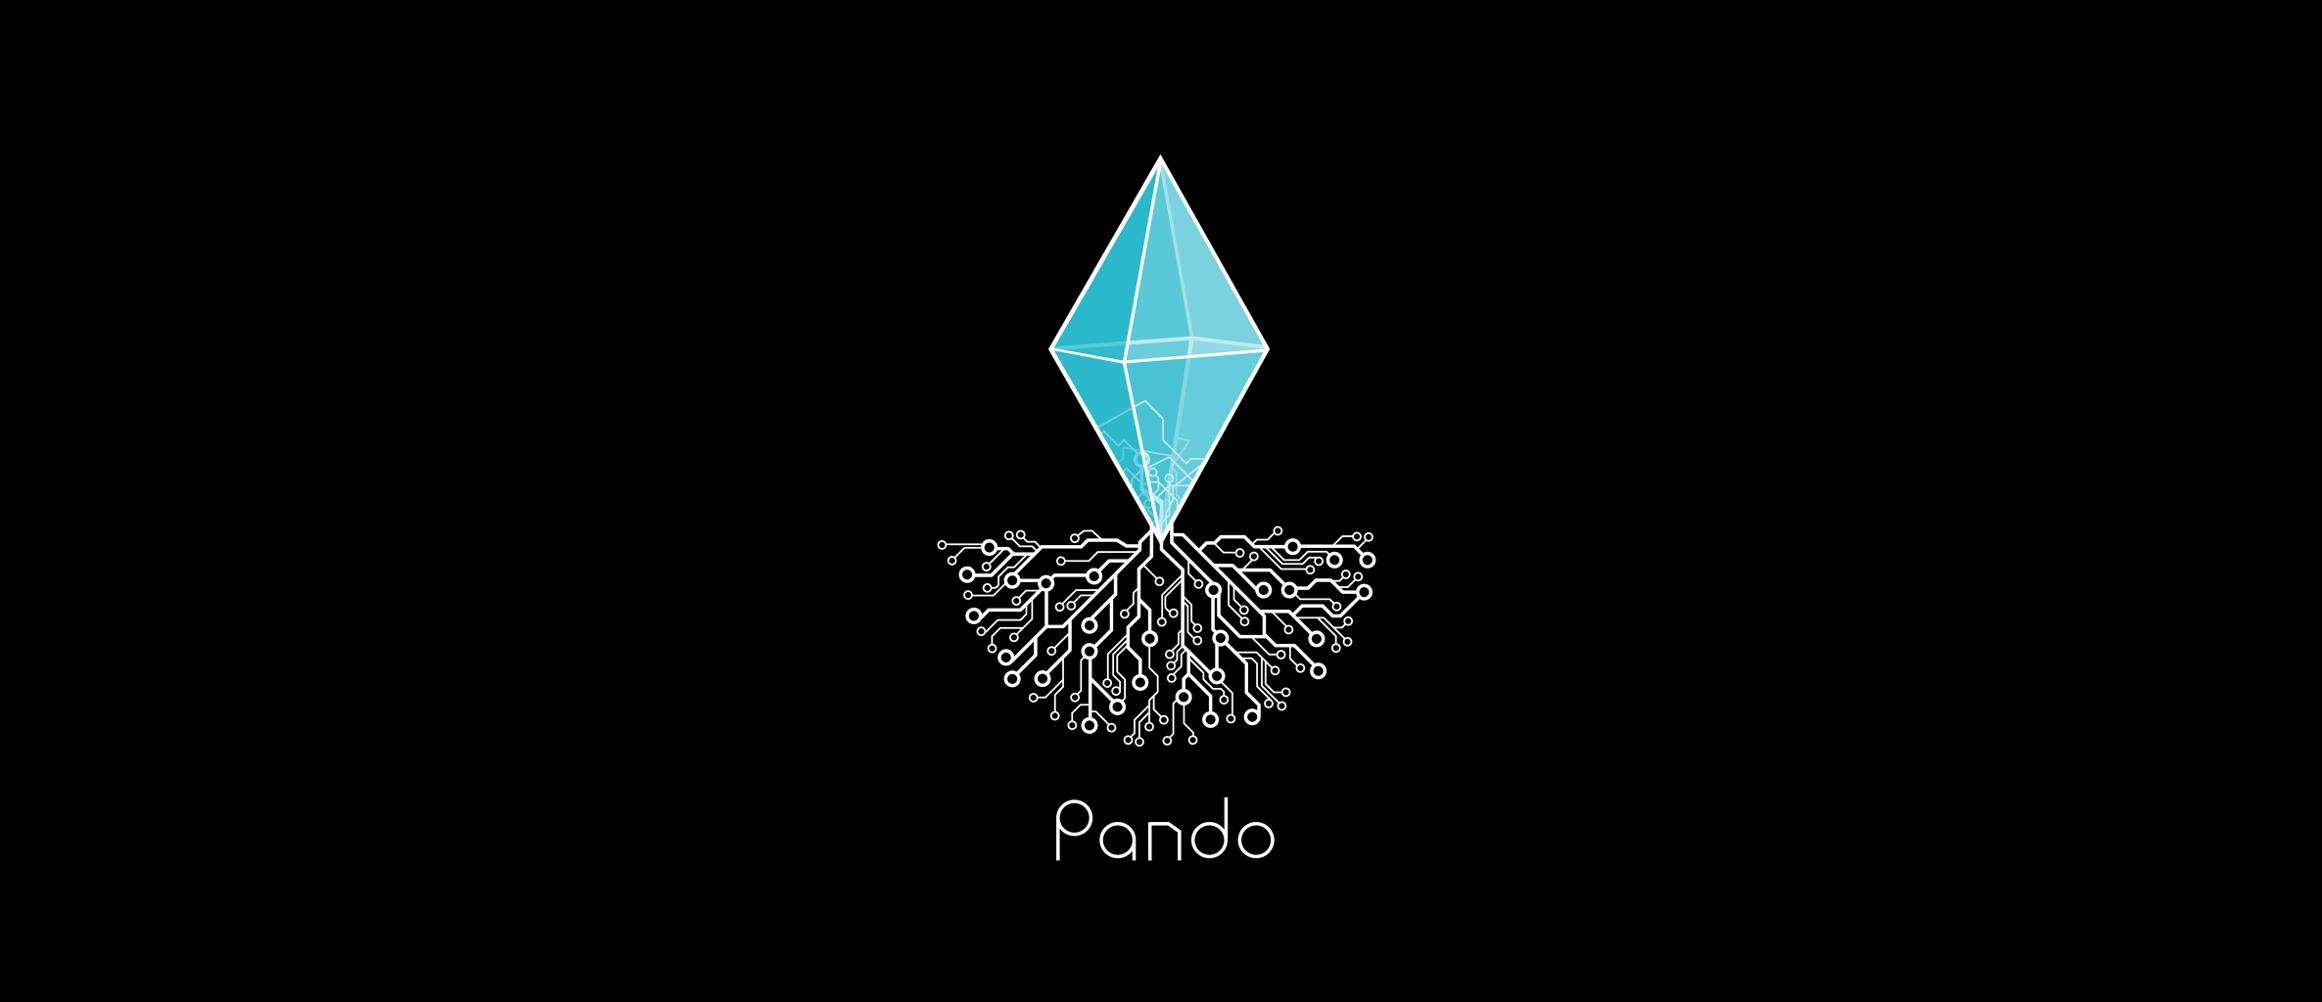 Nest Team Interviews: Pando